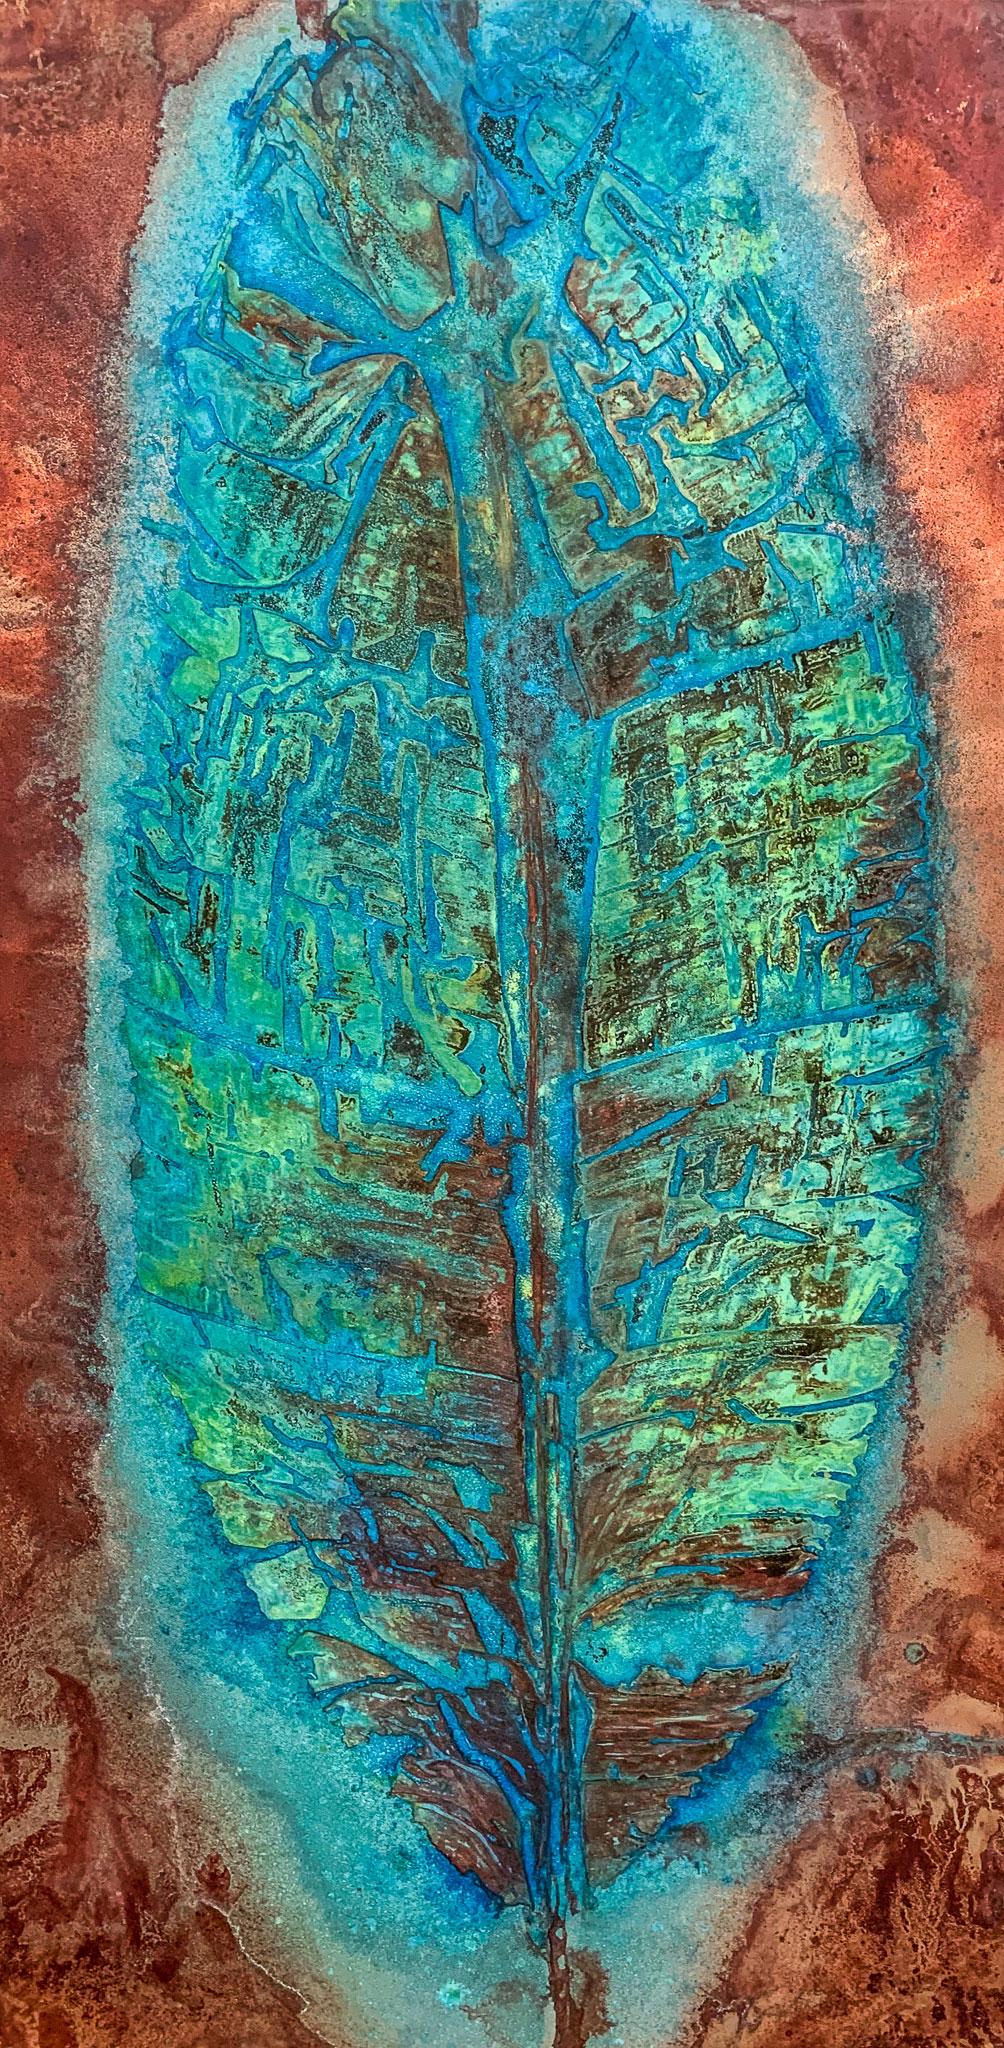 sanford-mcgee-copper-art-tennessee-franklin-magnolia-leaf.jpg